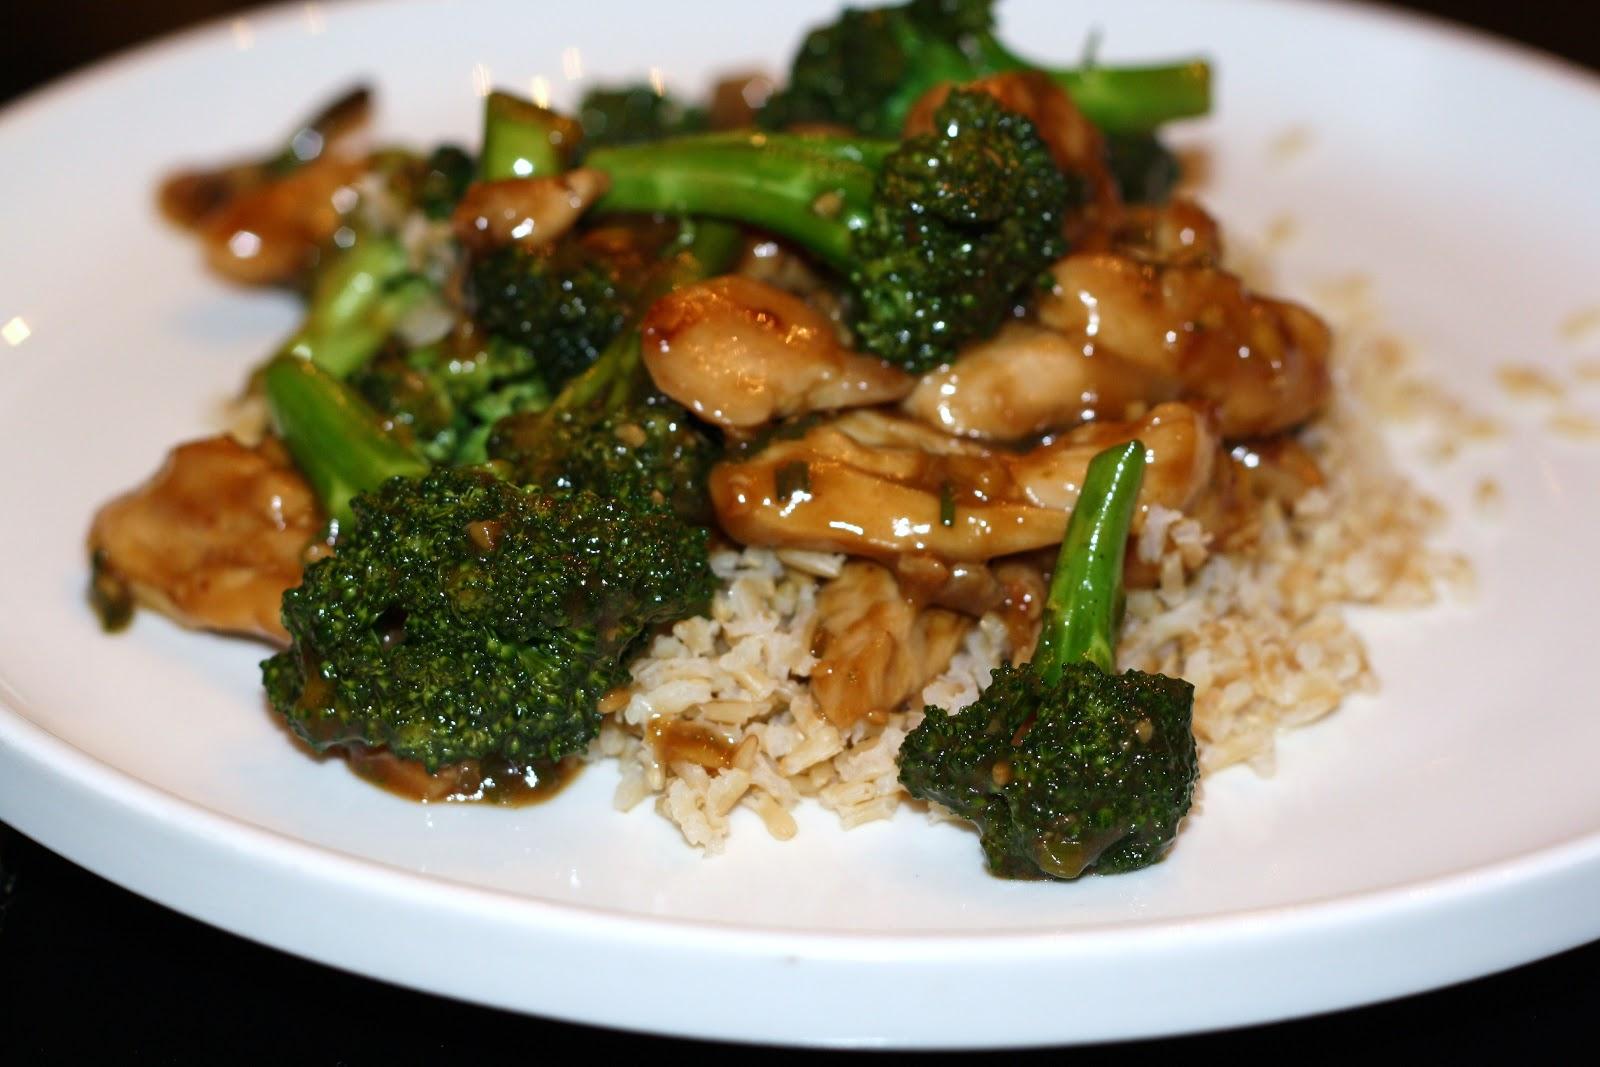 Thai Chicken with Broccoli